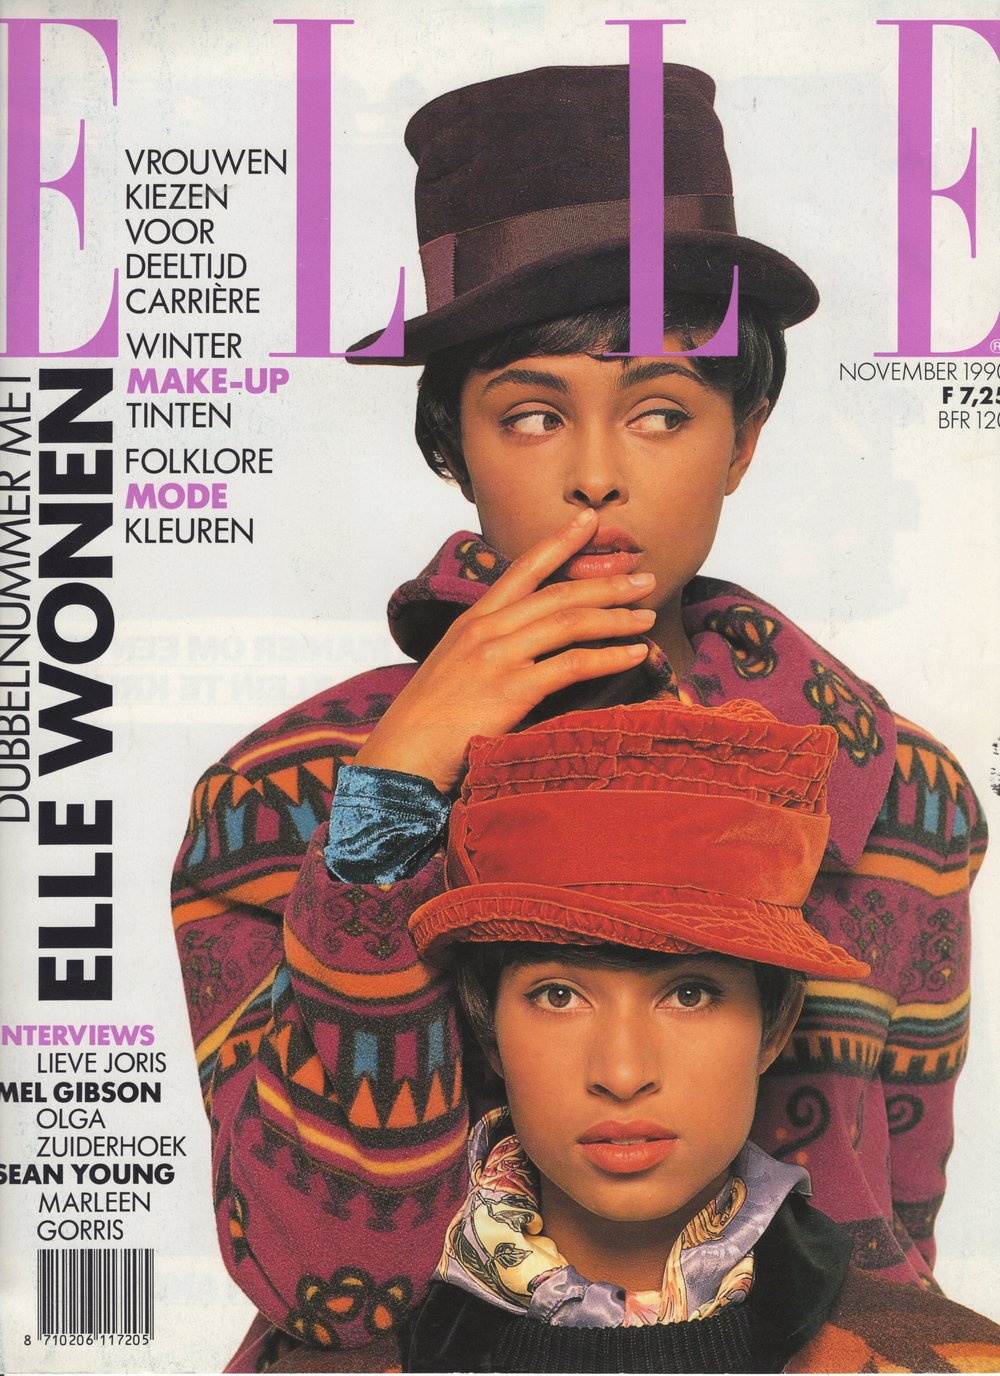 Dutch Elle 1991 copy.jpeg